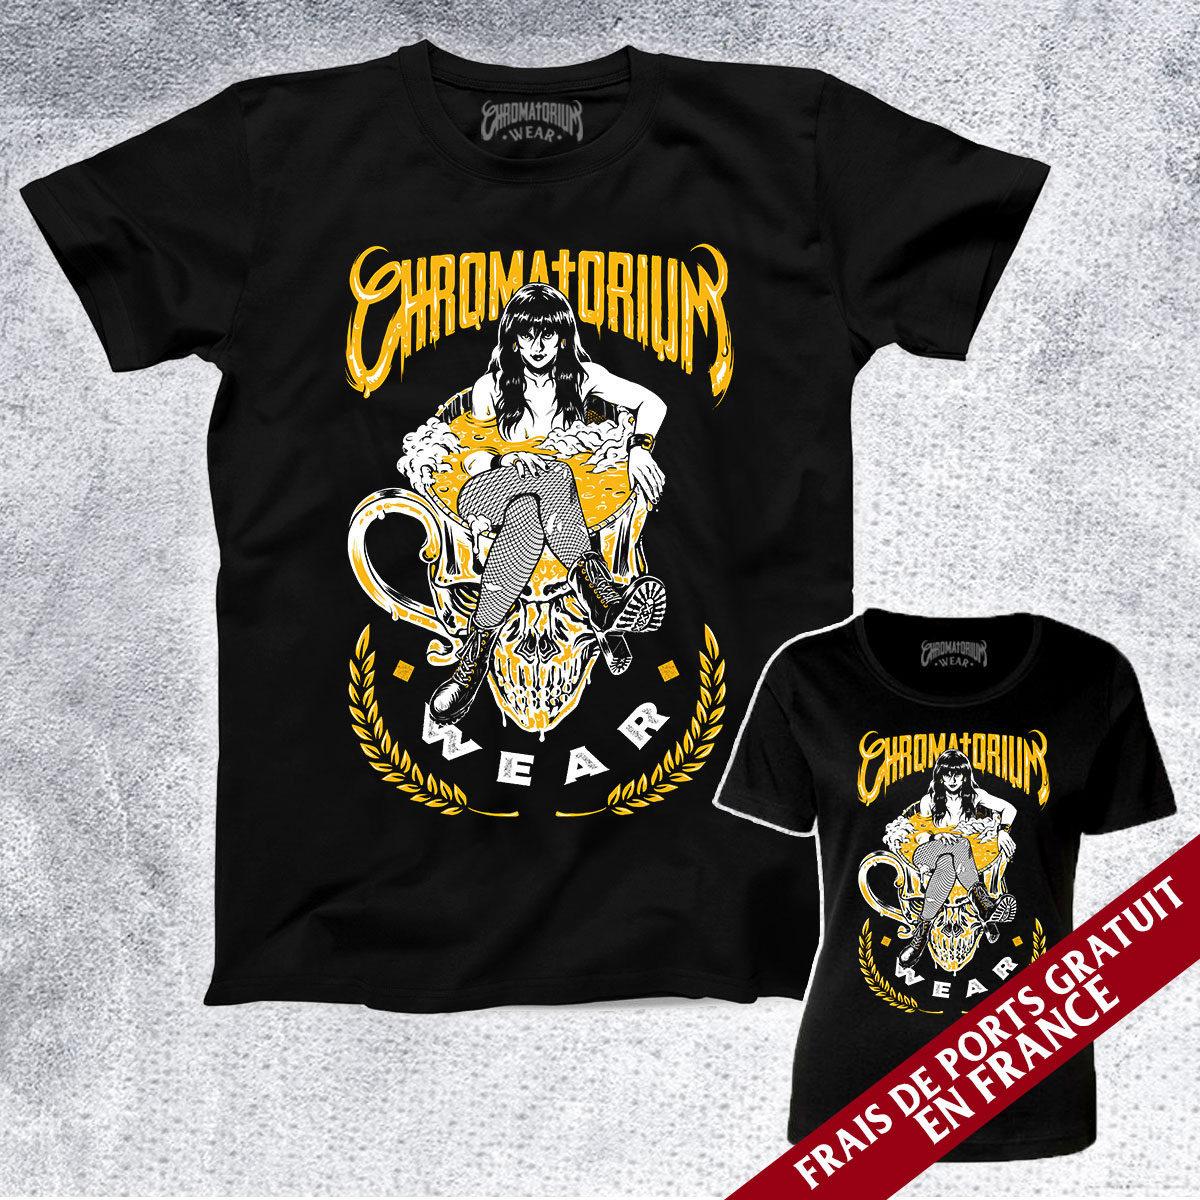 t-shirt noir avec impression sérigraphie girl bière beer tattoo